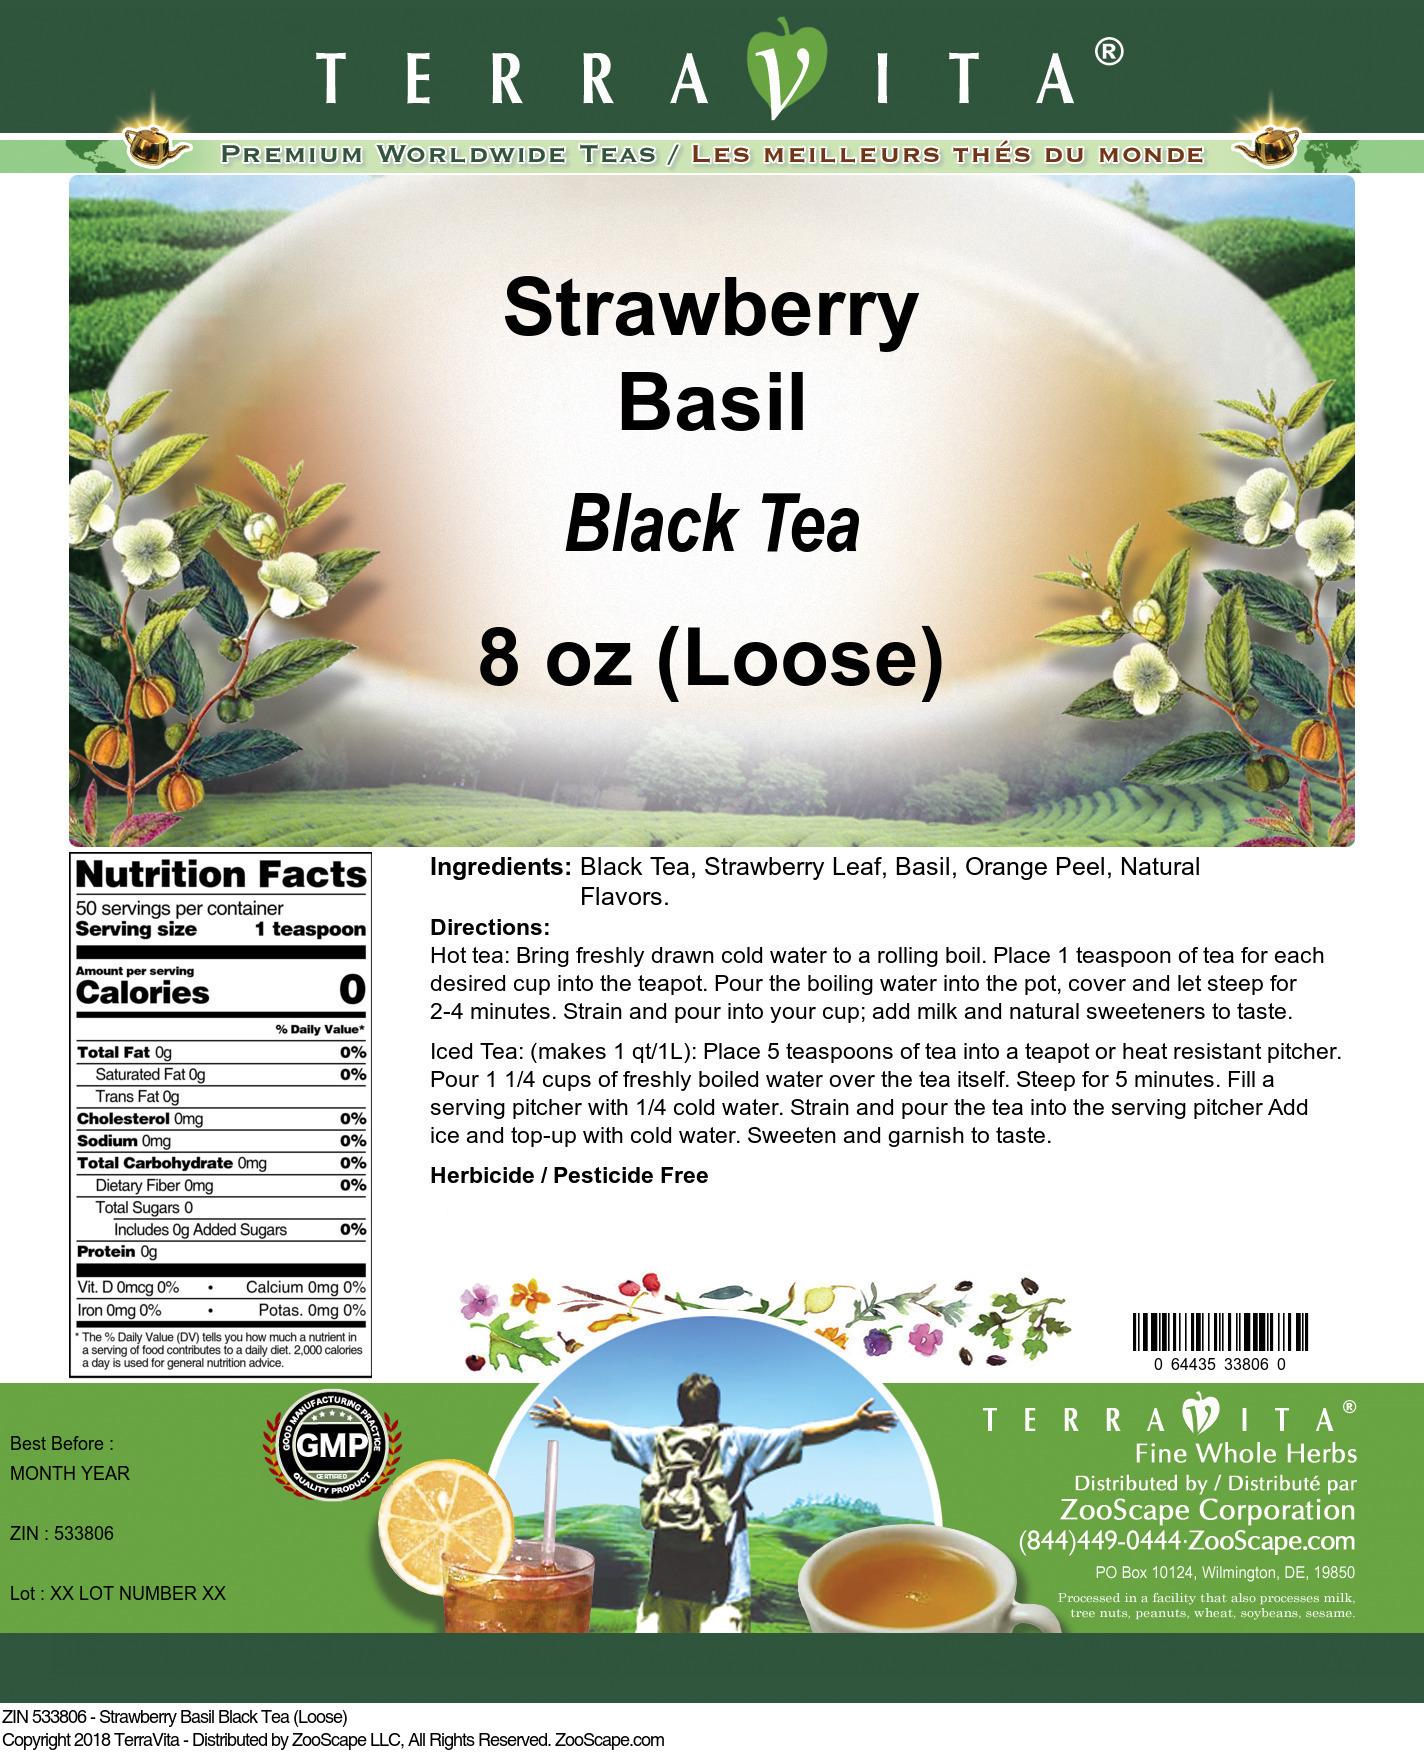 Strawberry Basil Black Tea